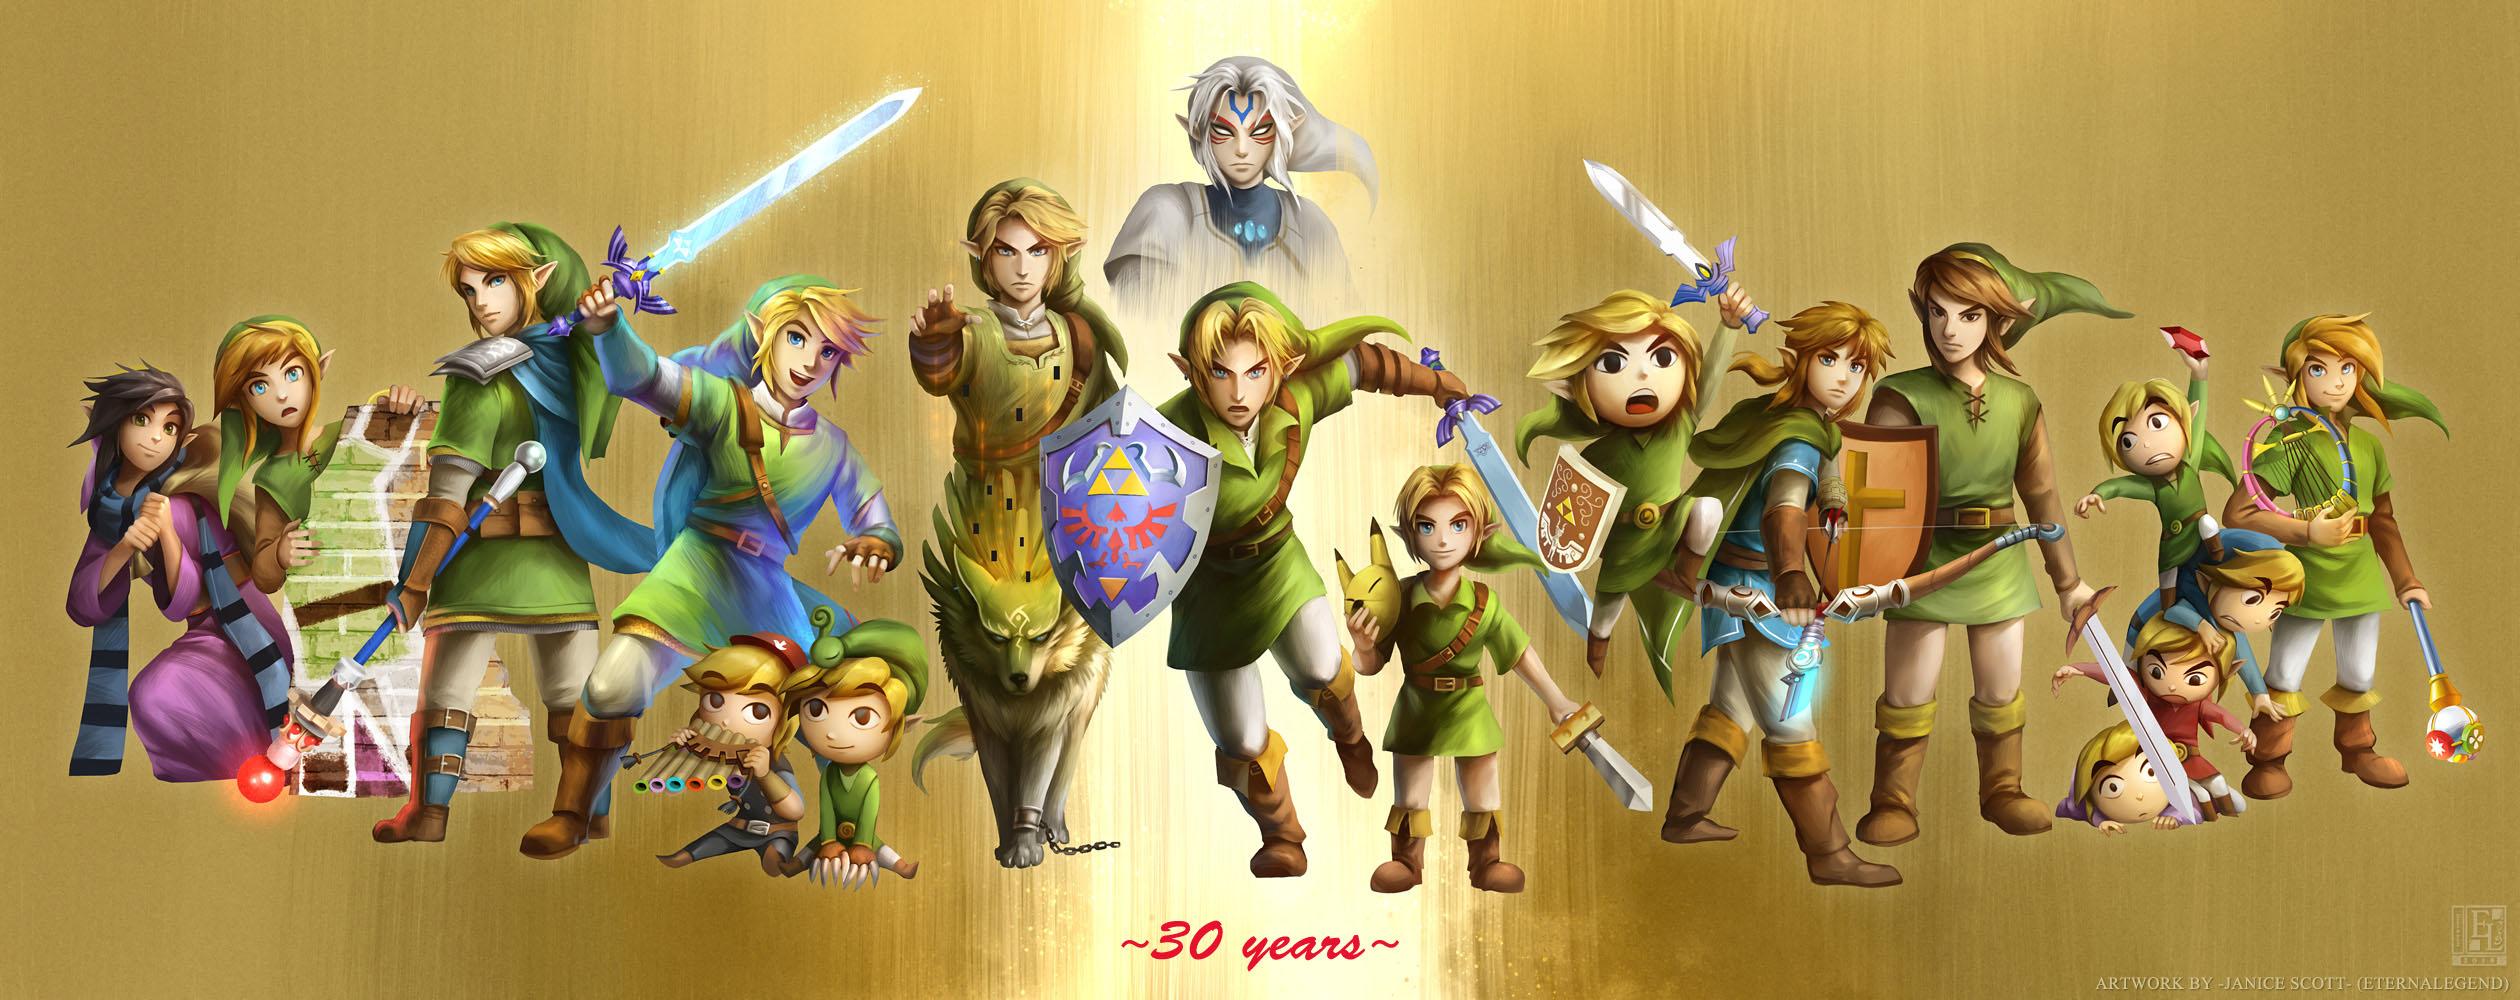 30th Anniversary Of The Legend Of Zelda: EL Celebrates It